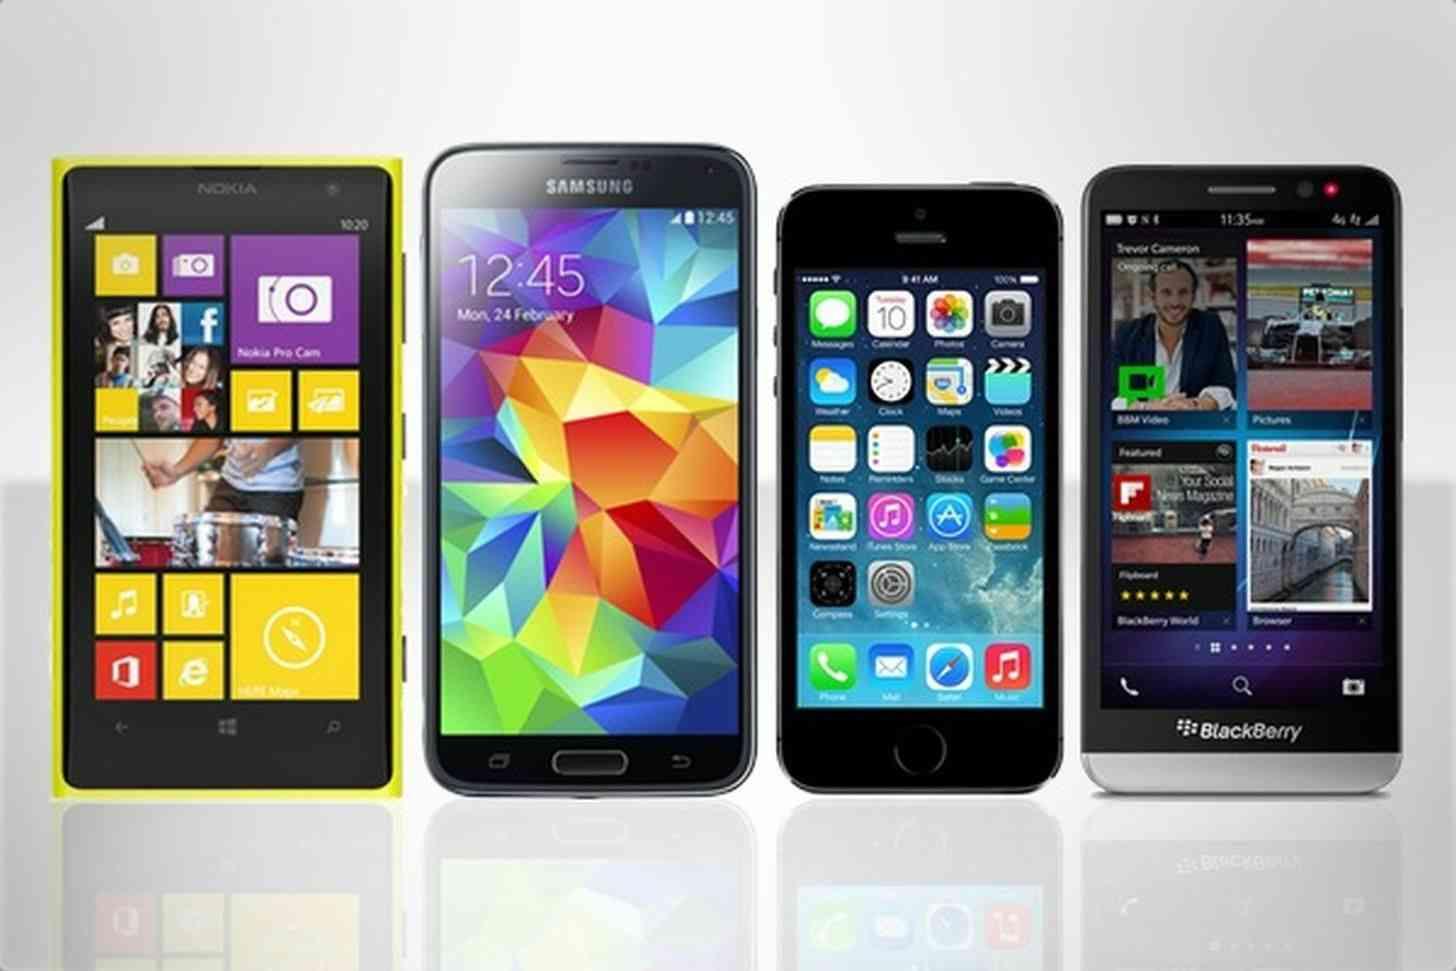 Windows Phone, Android, iOS, BlackBerry